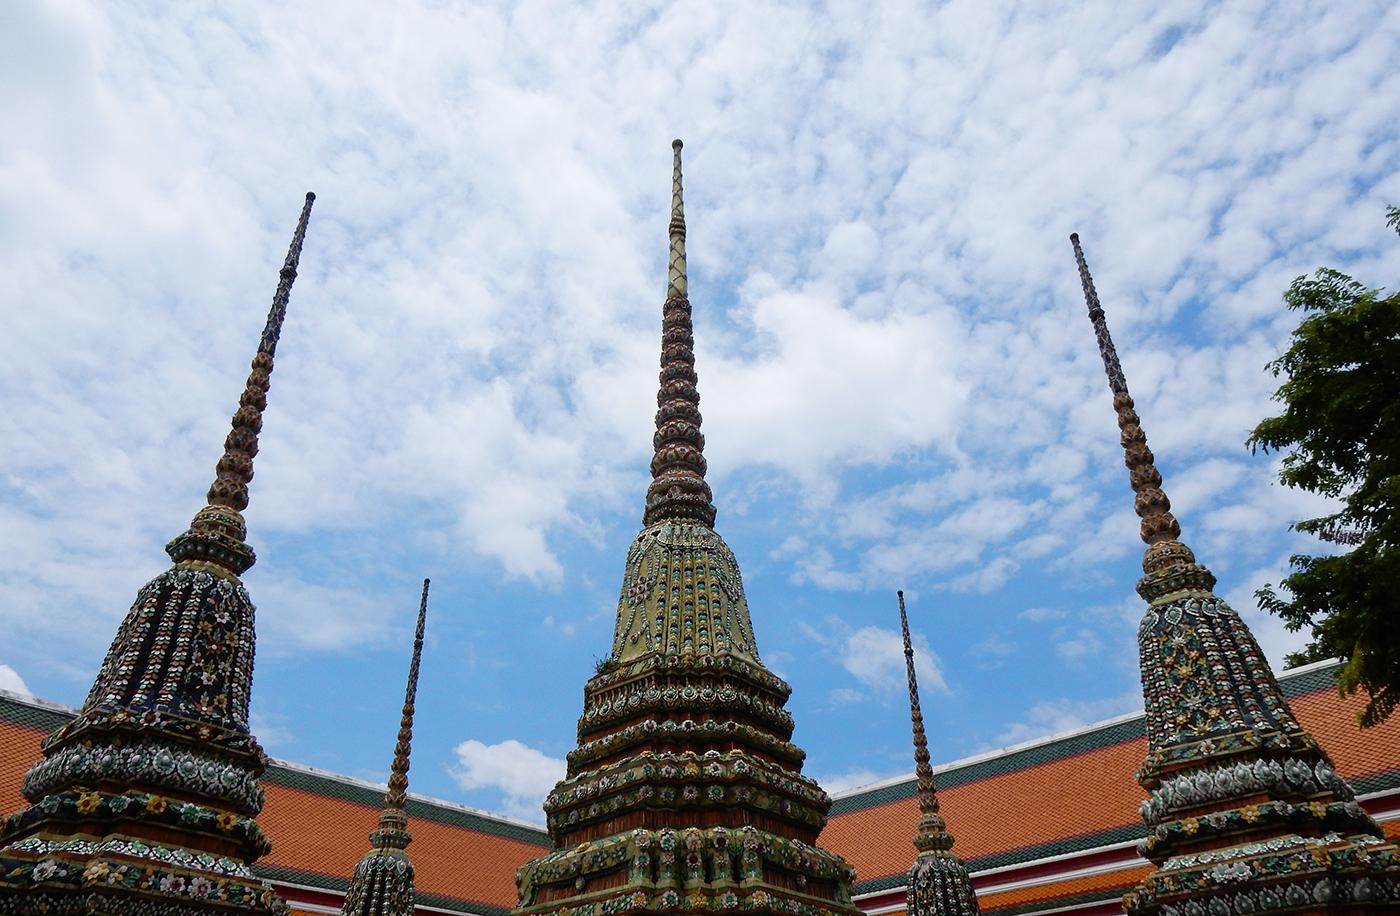 Wat Phra Chetuphon Wat Pho lying boeddha liggende boedha bangkok reizen travel lifestyle by linda